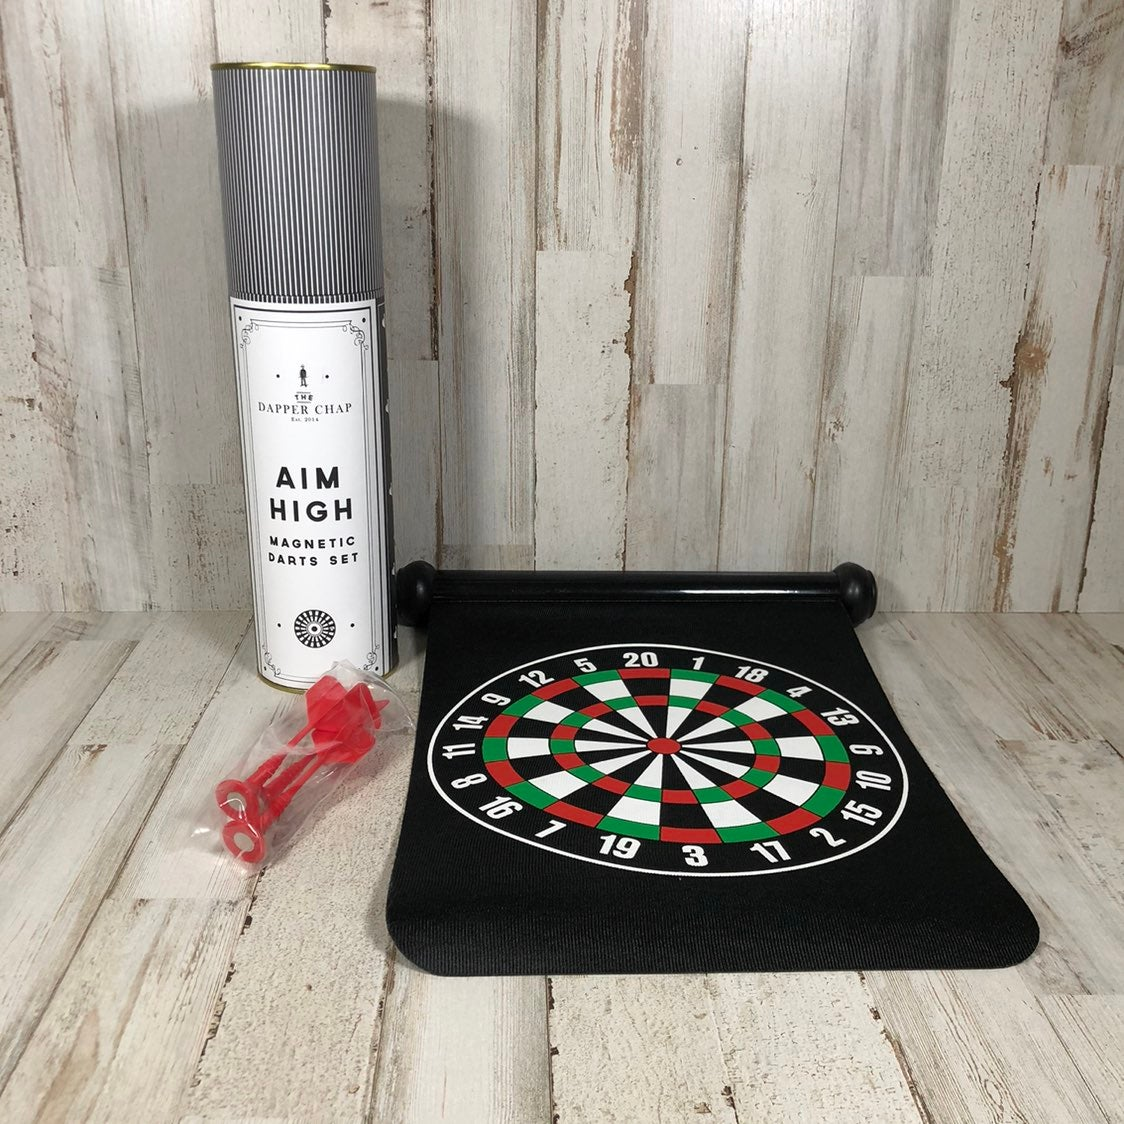 Magnetic Dart Set